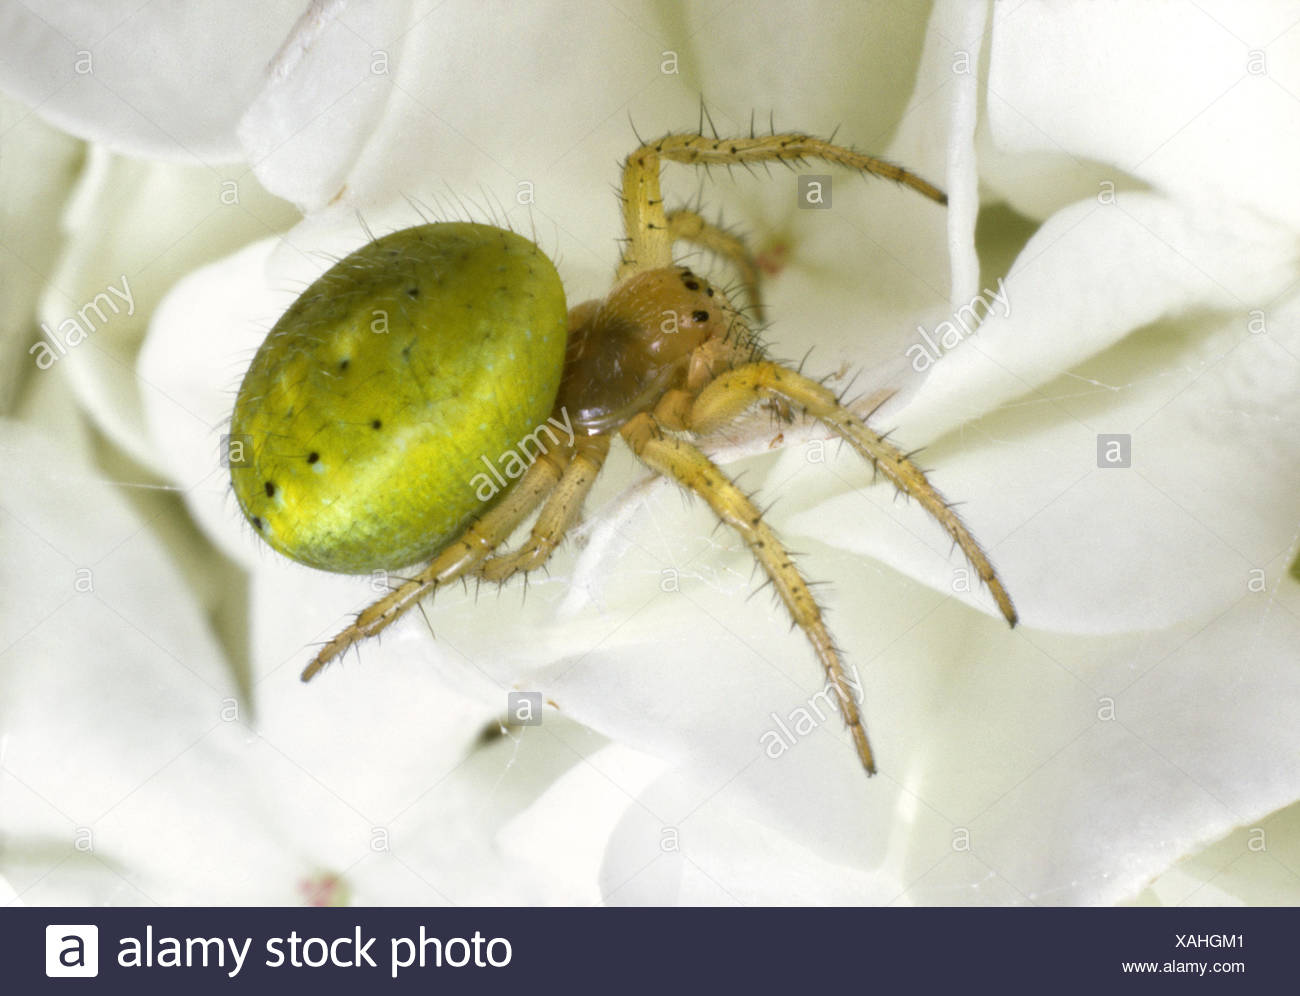 Green Orb-weaver Spider - Araniella cucurbitina - Stock Image